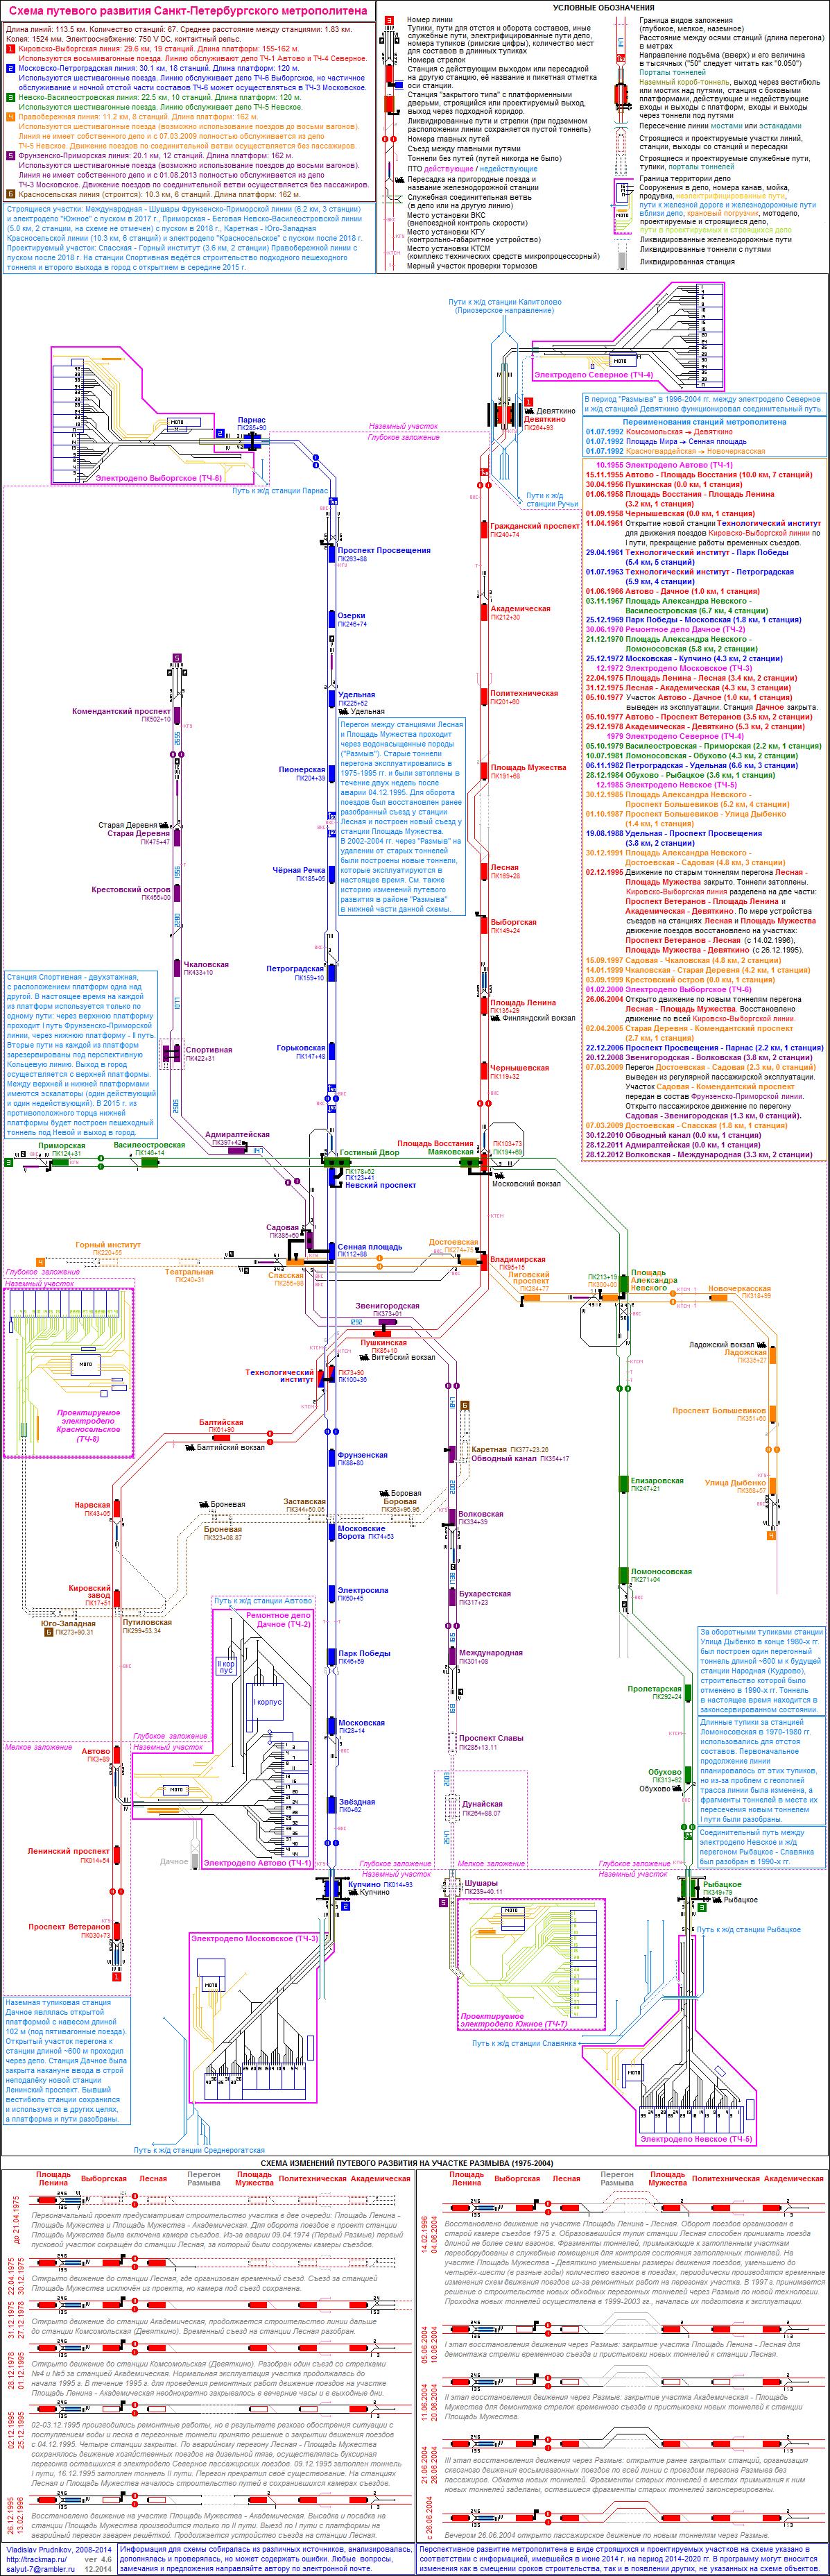 Метро днепропетровска схема